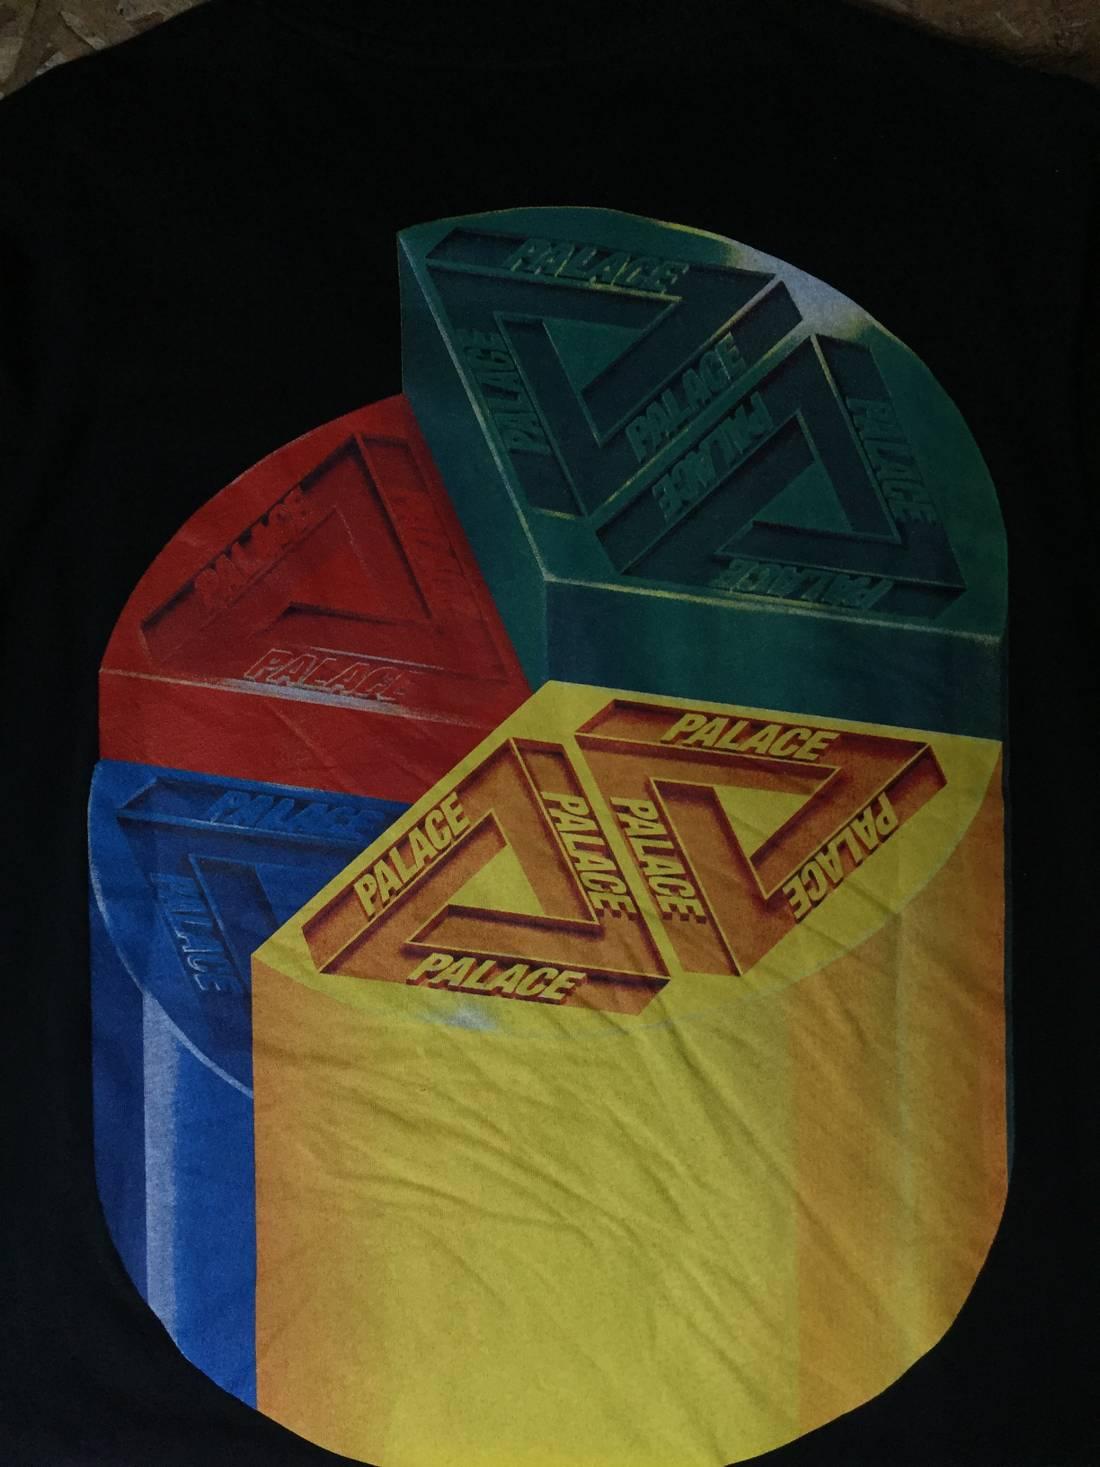 Palace pie chart tee size m short sleeve t shirts for sale grailed palace pie chart tee size us m eu 48 50 2 3 nvjuhfo Image collections